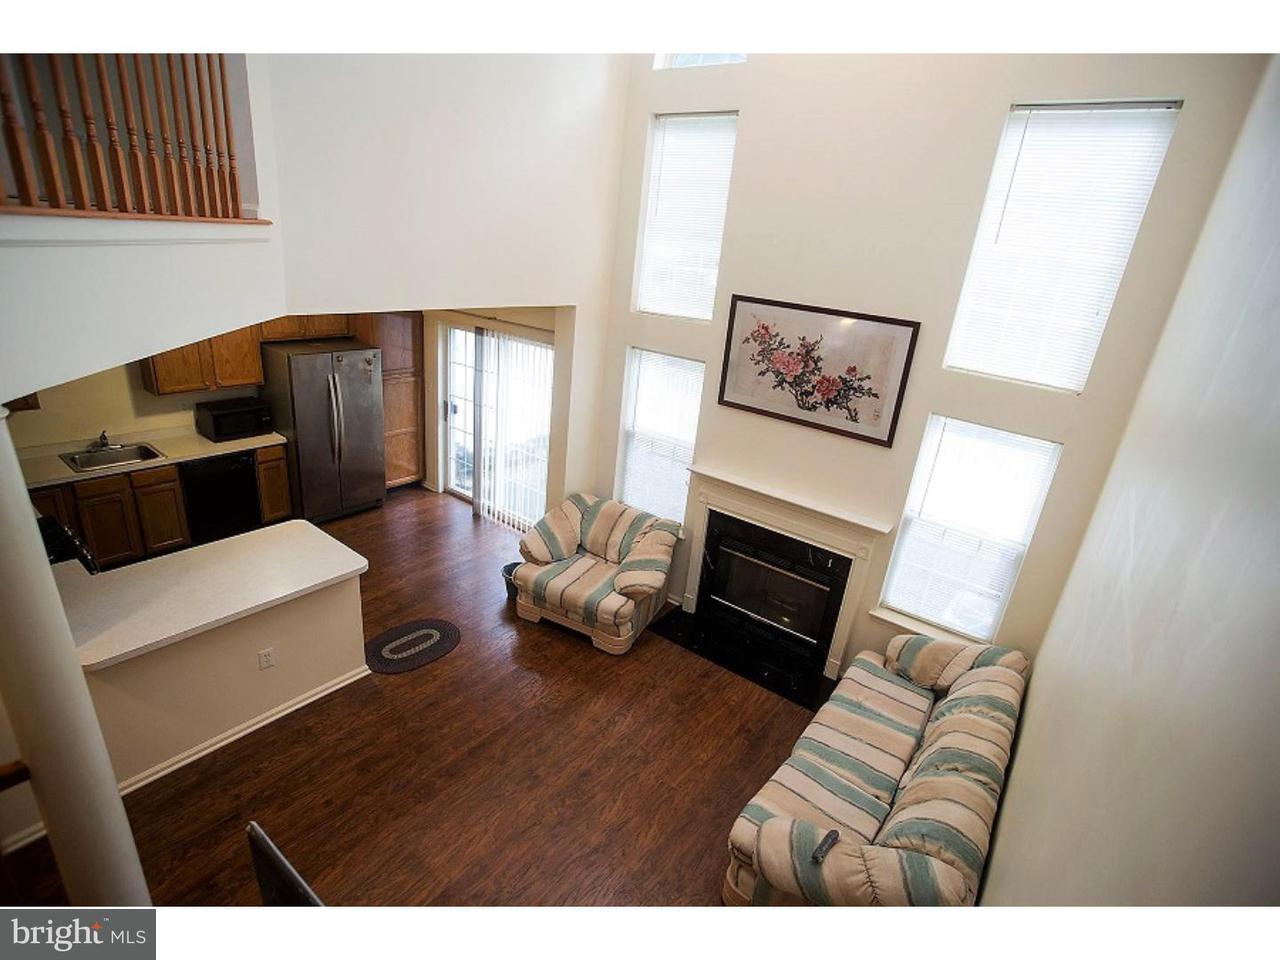 Townhouse for Sale at 8 HILTON Court Pennington, New Jersey 08534 United StatesMunicipality: Hopewell Township